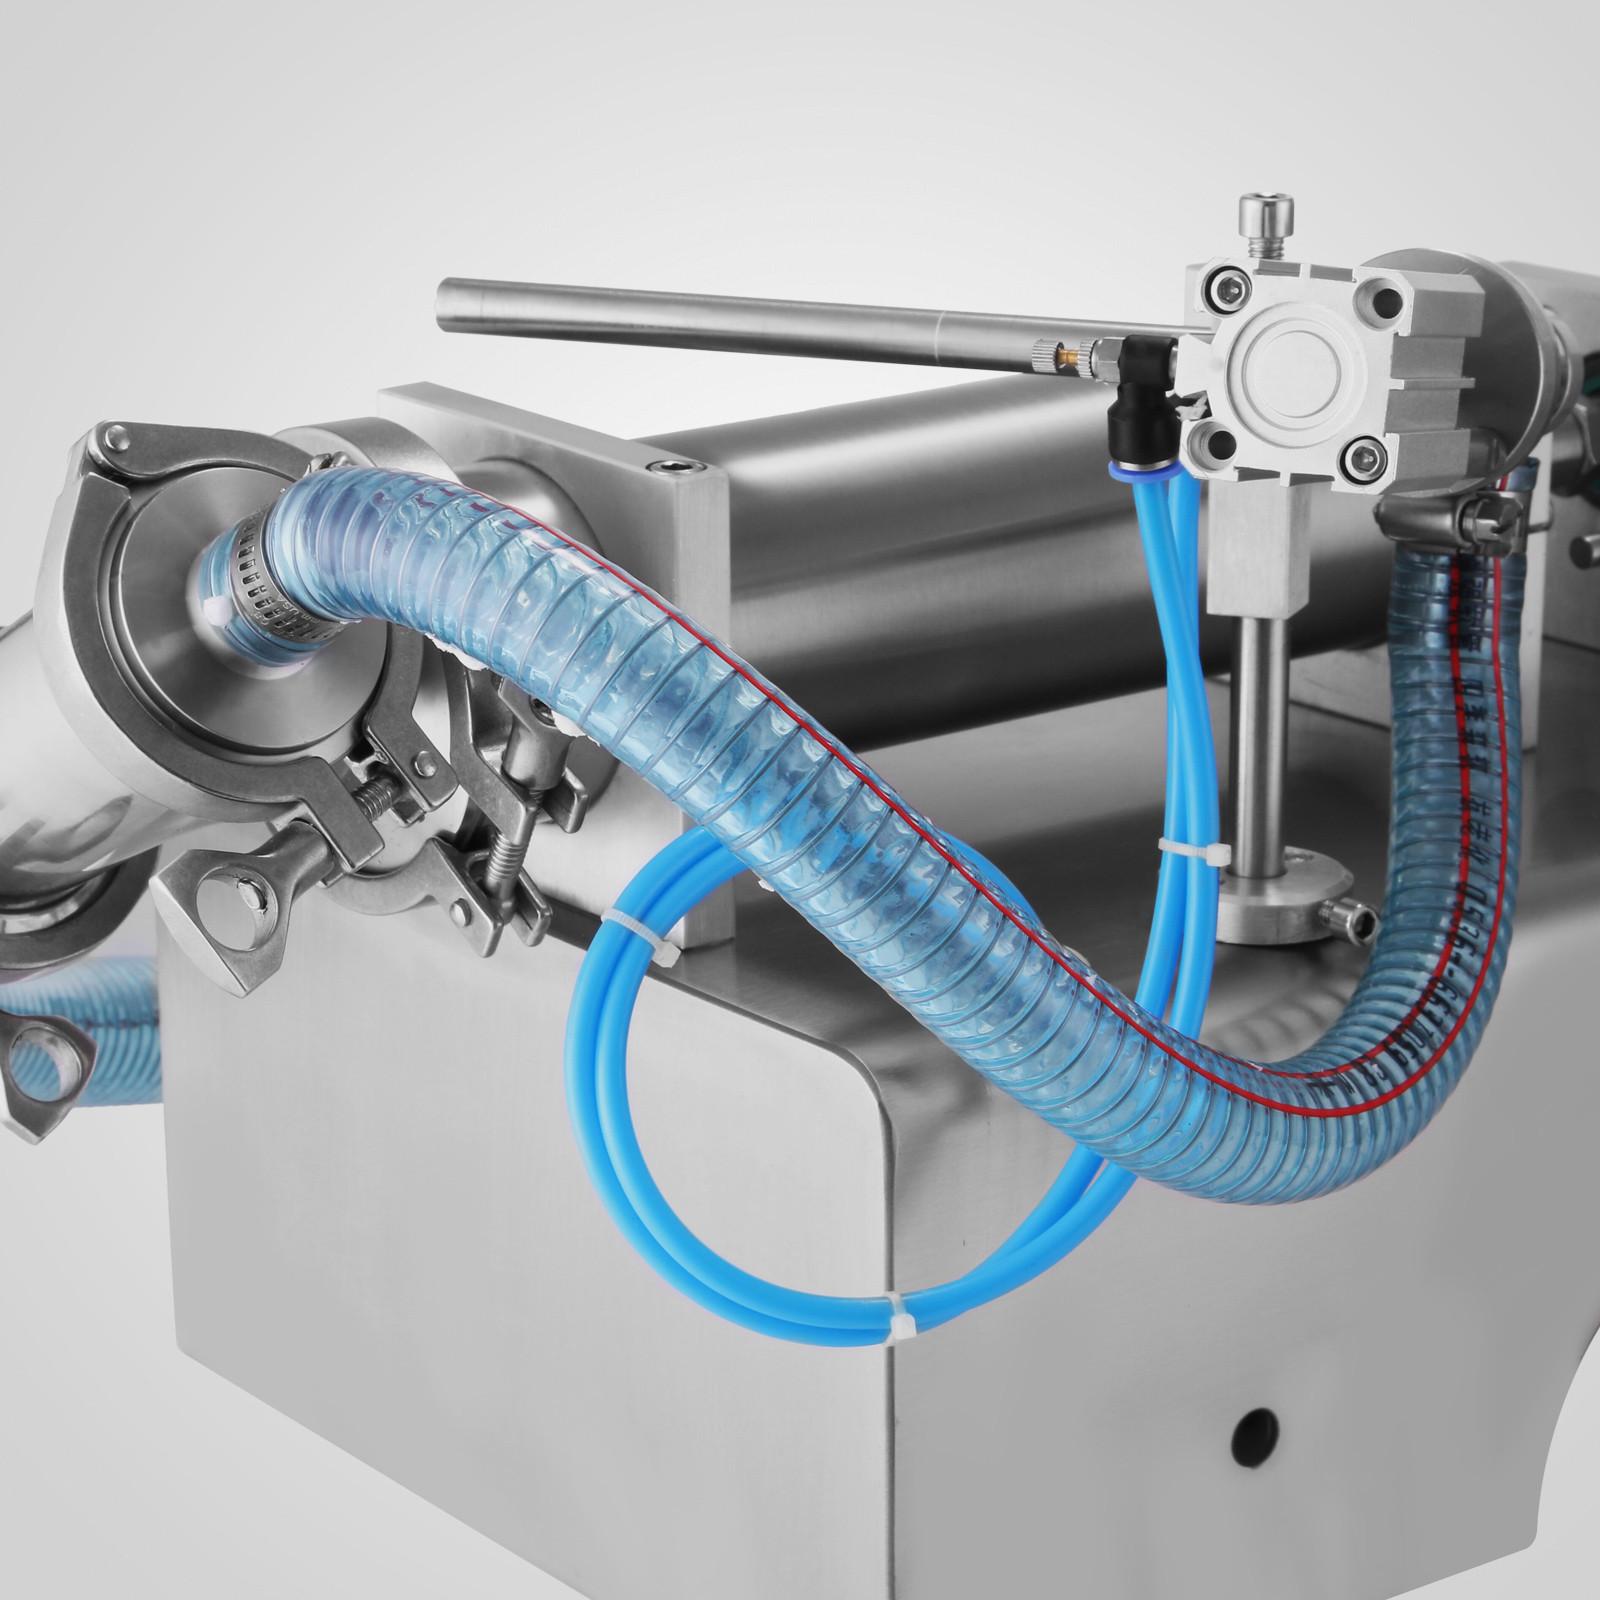 Liquid-Filling-Machine-Filler-Remplissage-2-3500ML-50-500ML-INDUSTRY-SUPPLY miniature 71